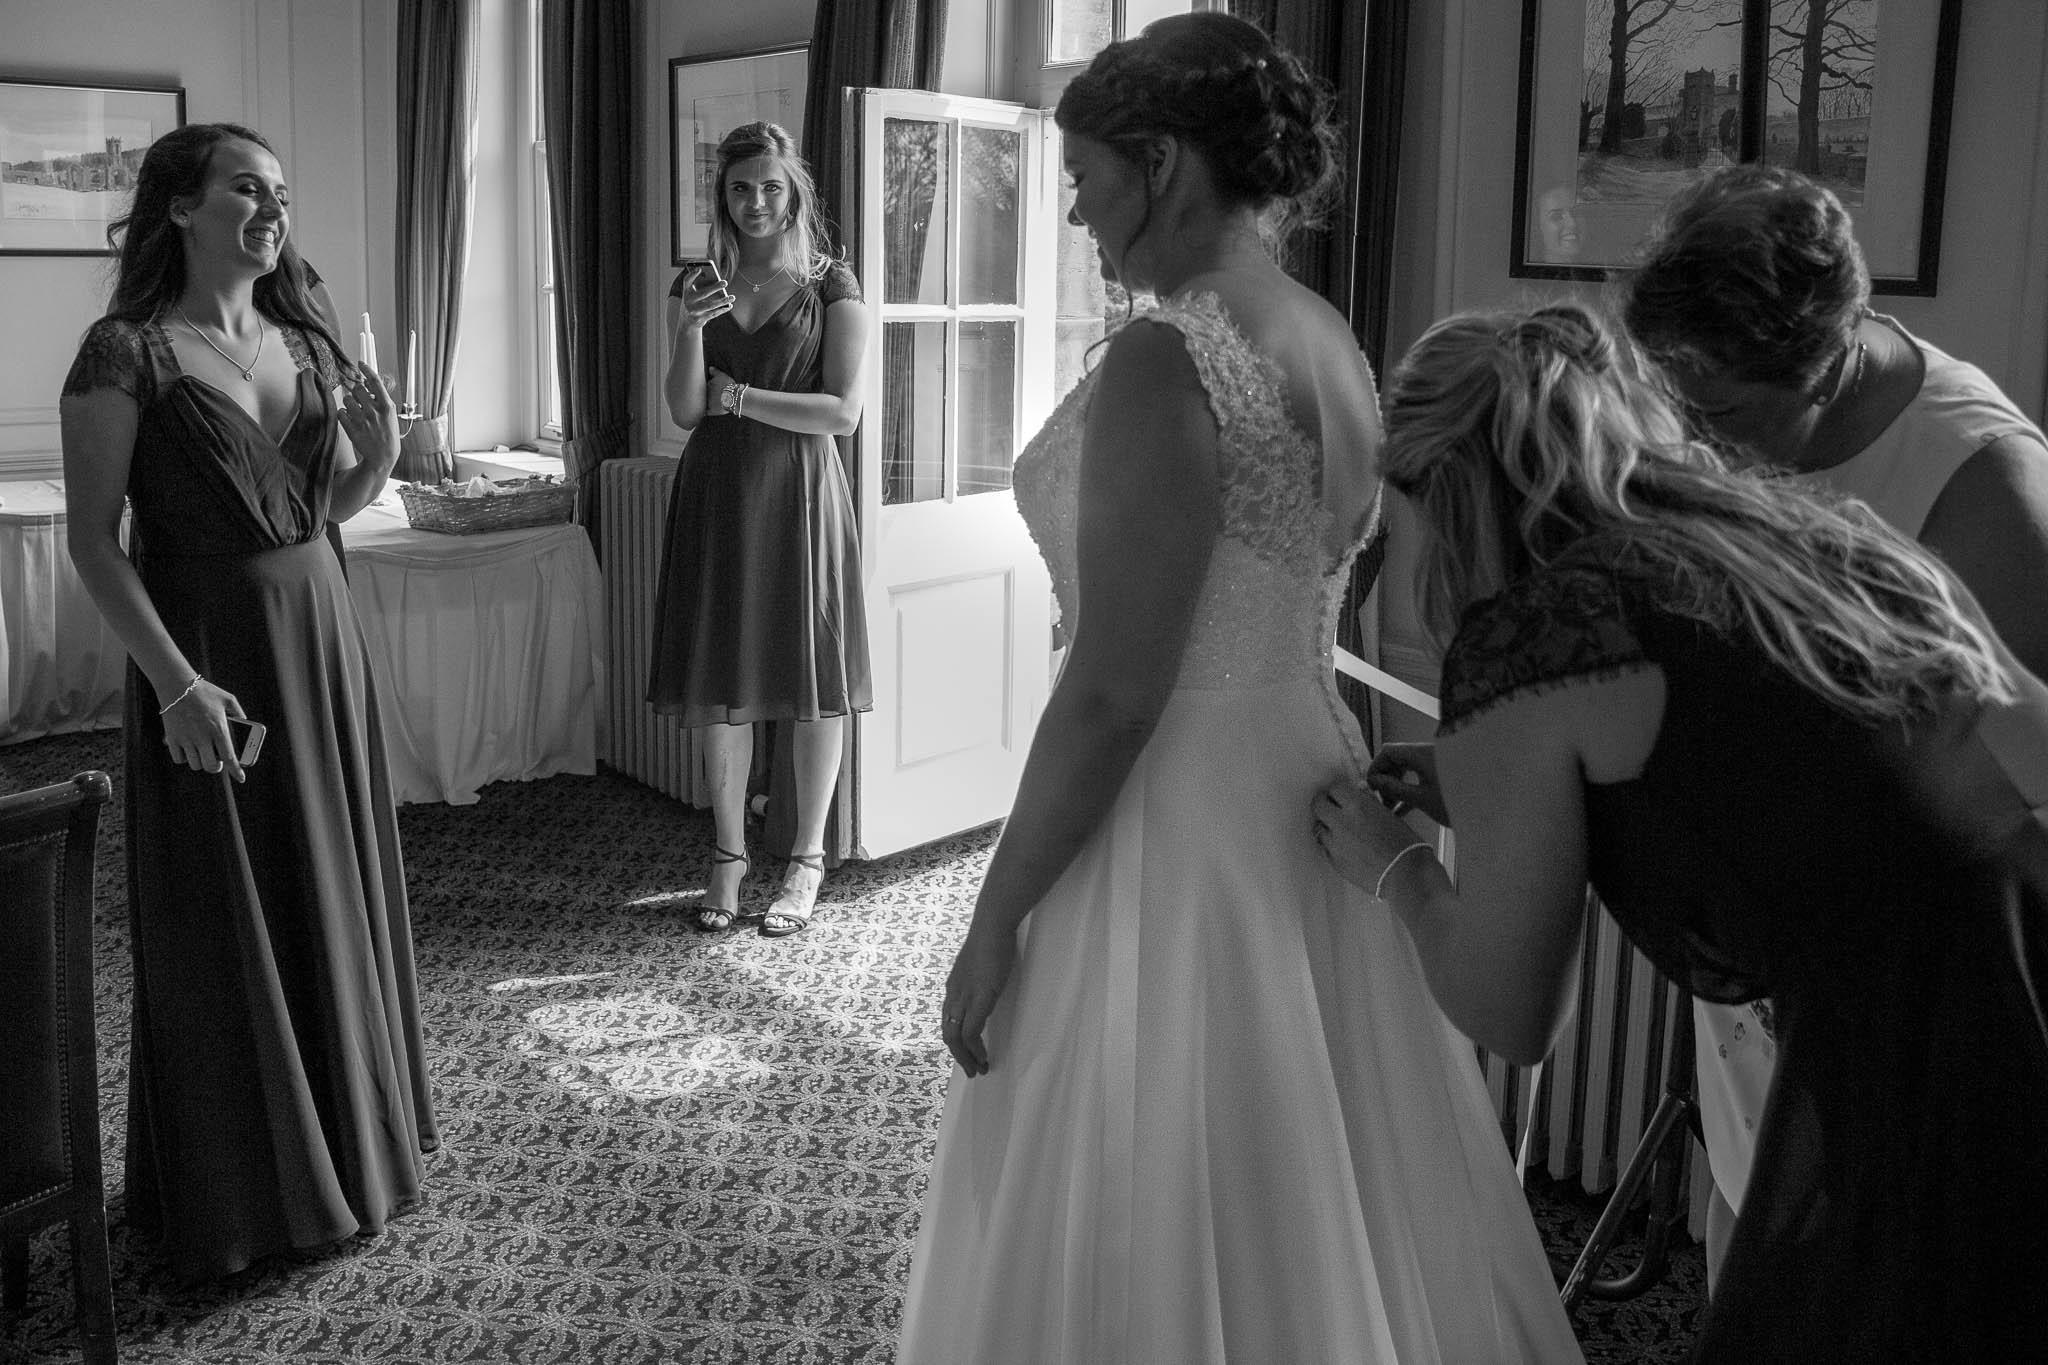 Crathorne Hall Hotel Wedding Photographer40.jpg